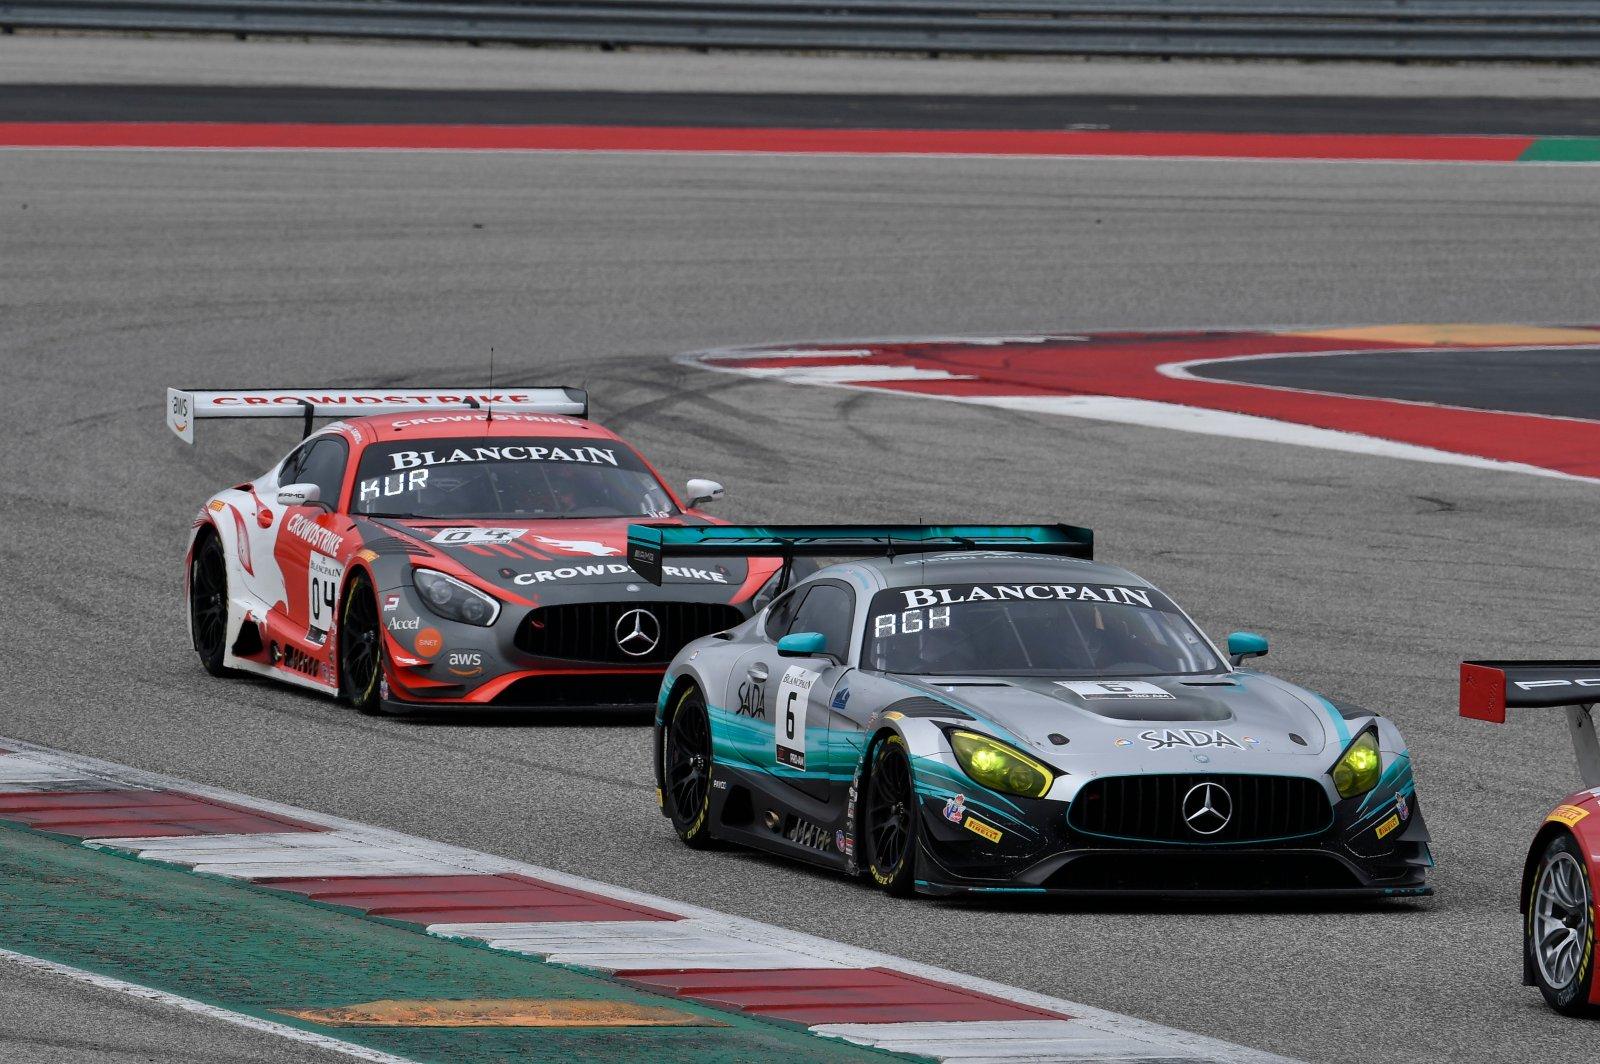 US RaceTronics, Steven Aghakhani, Richard Antinucci, Mercedes-AMG GT3, Sada Systems, #04: DXDT Racing, George Kurtz, Colin Braun, Mercedes-AMG GT3, Crowdstri